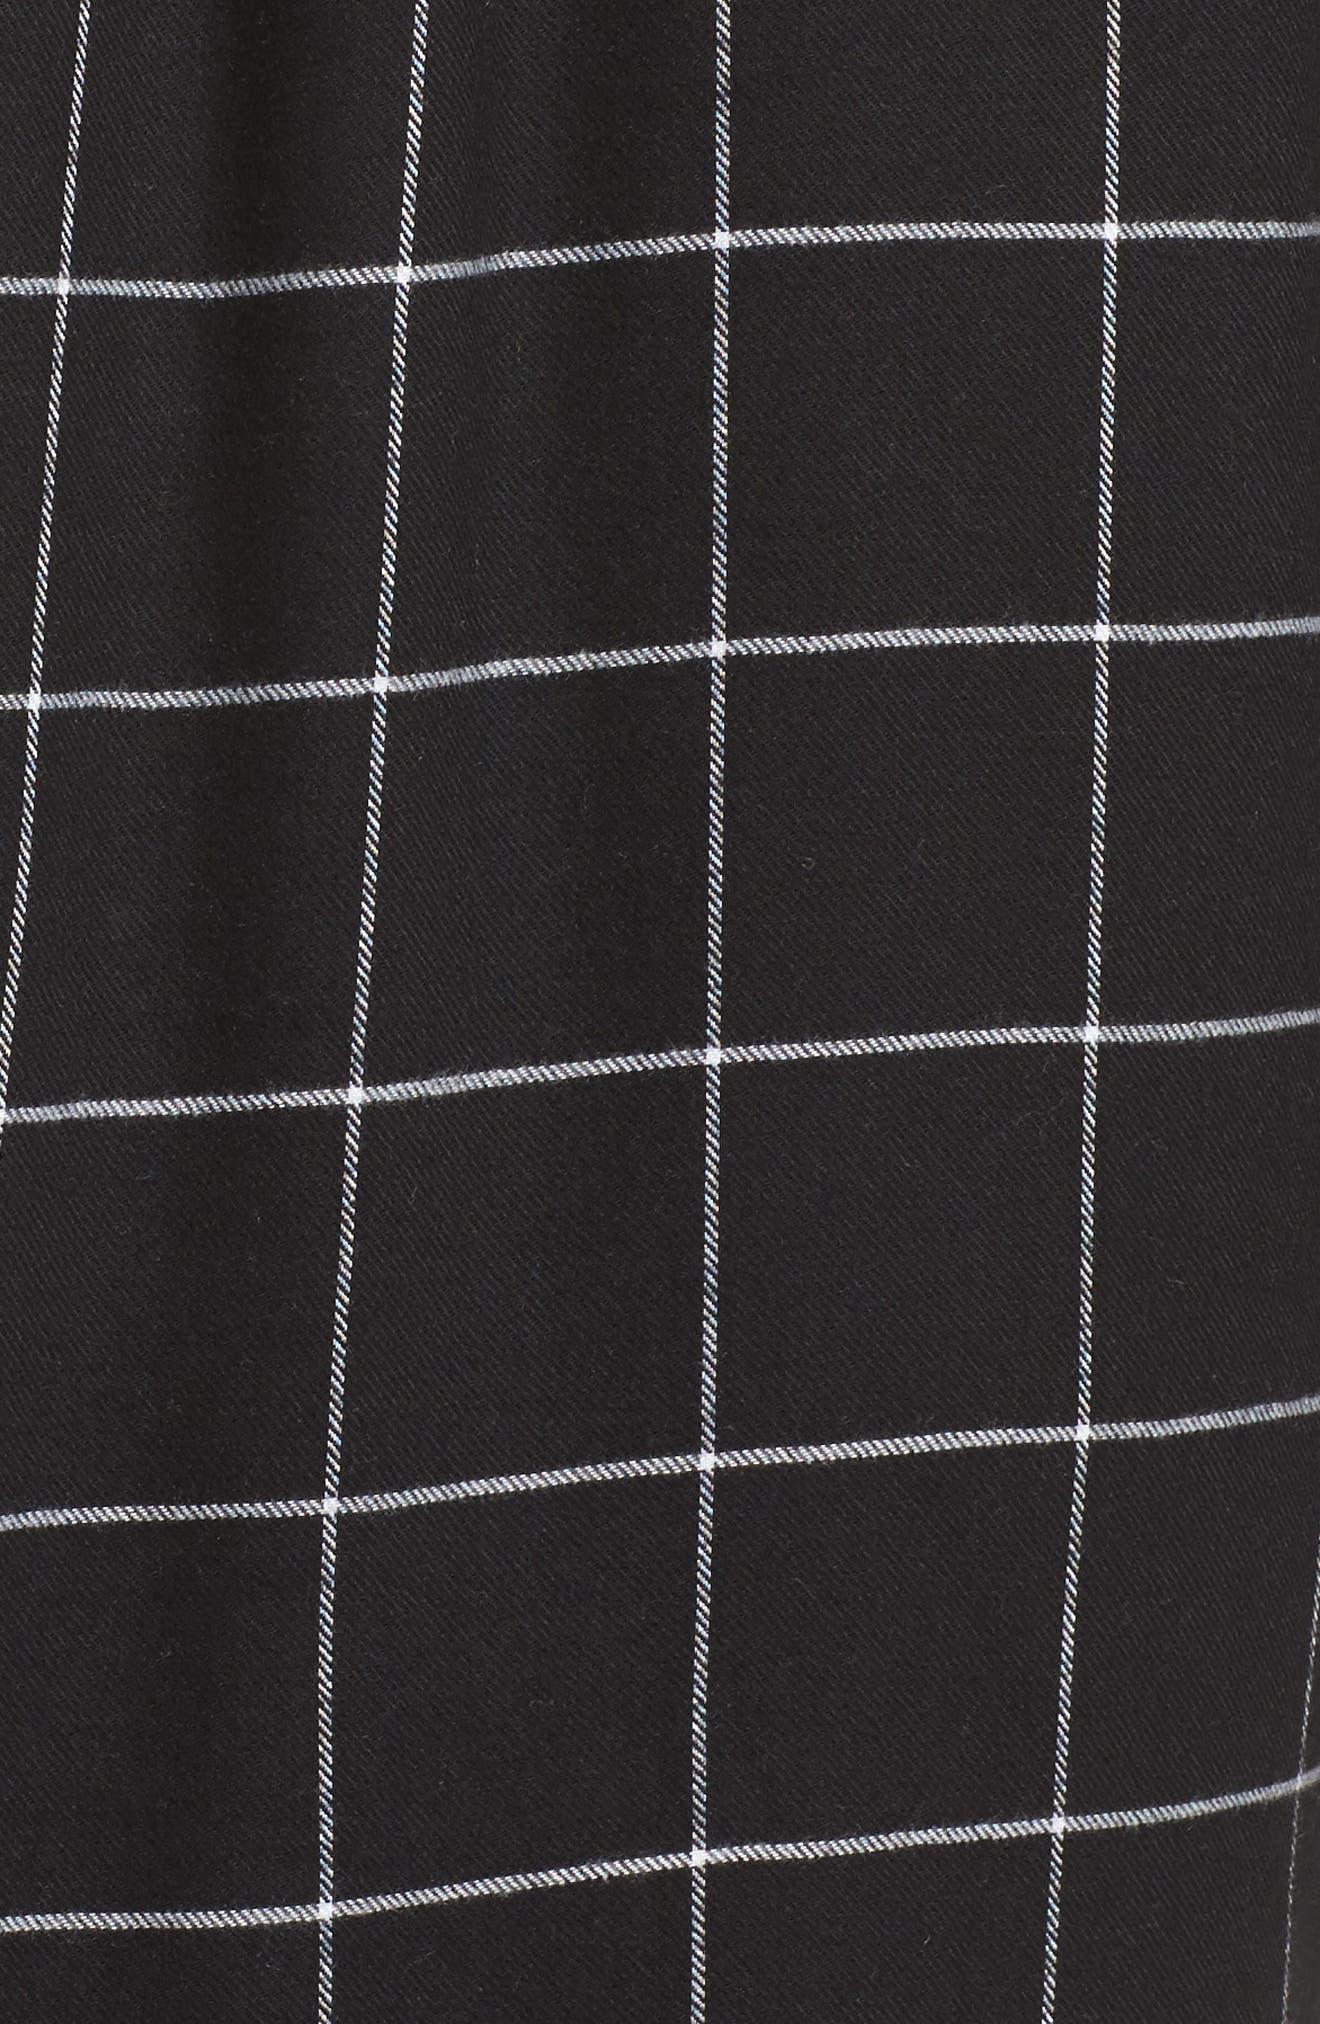 Maxi Sleep Shirt,                             Alternate thumbnail 5, color,                             001